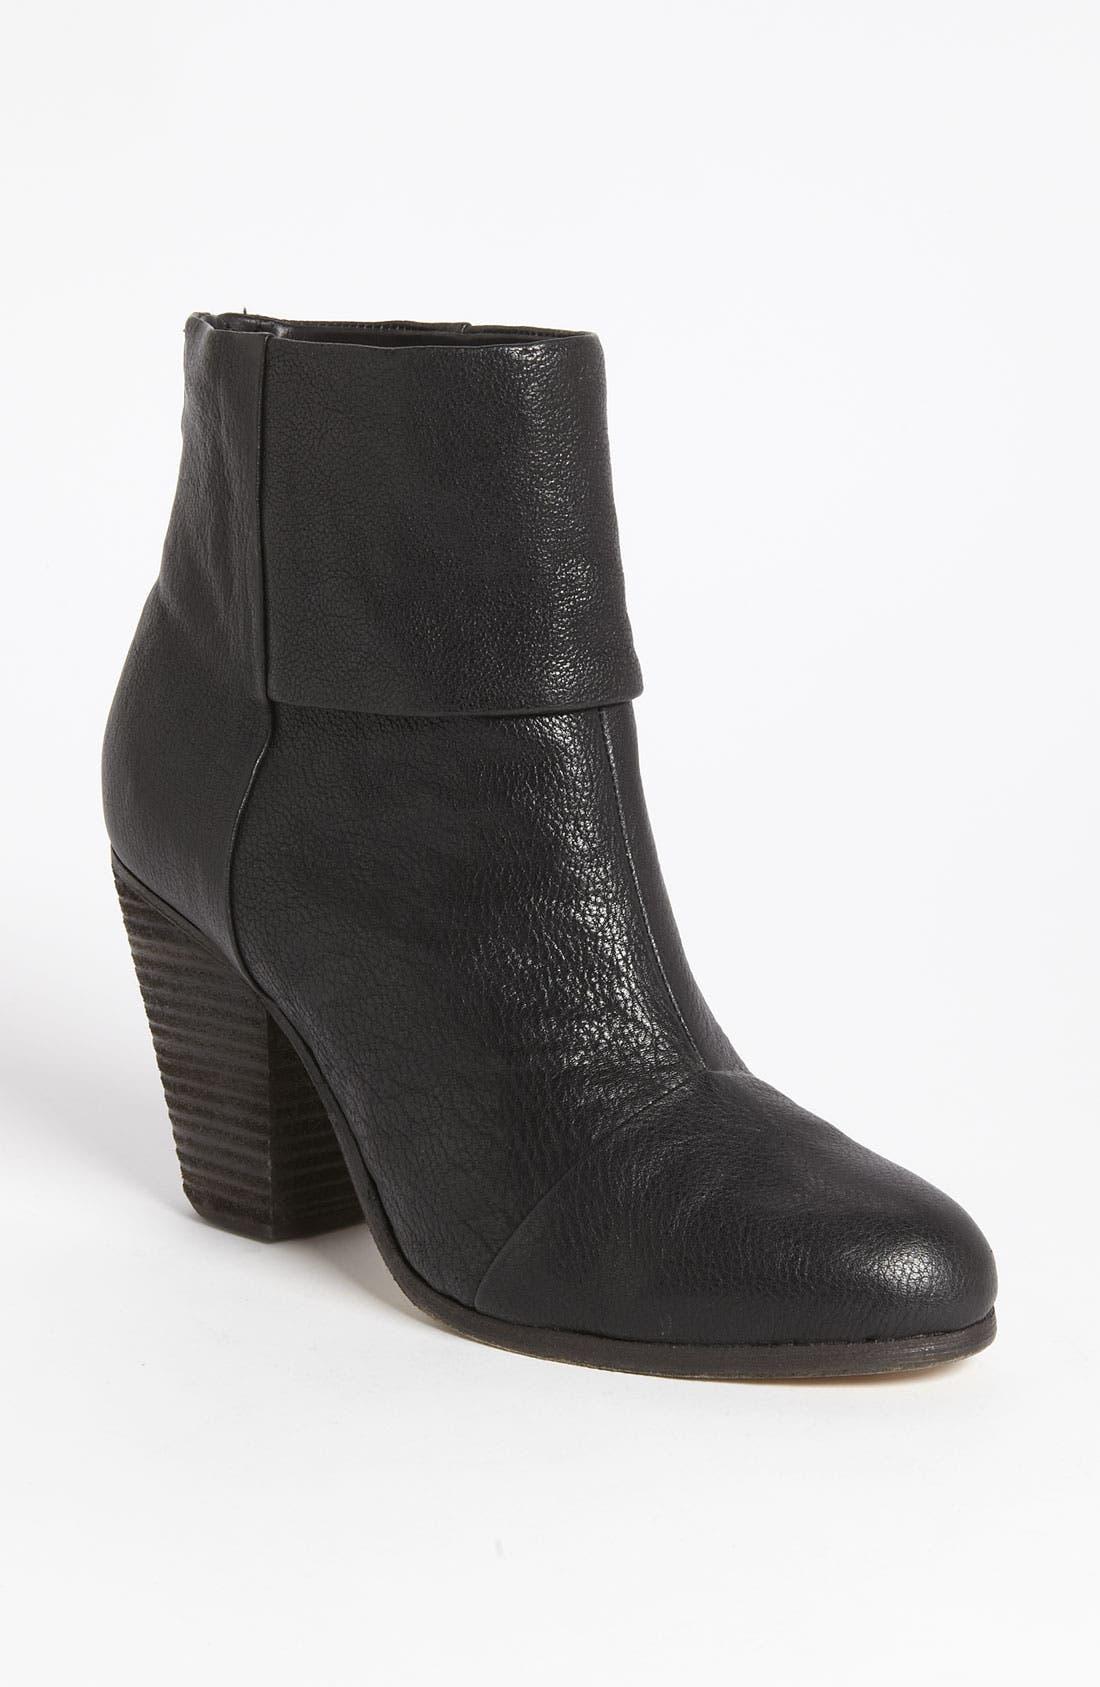 Womens Boots Great 30648201 Rag Bone Newbury 6us 36eu Brown